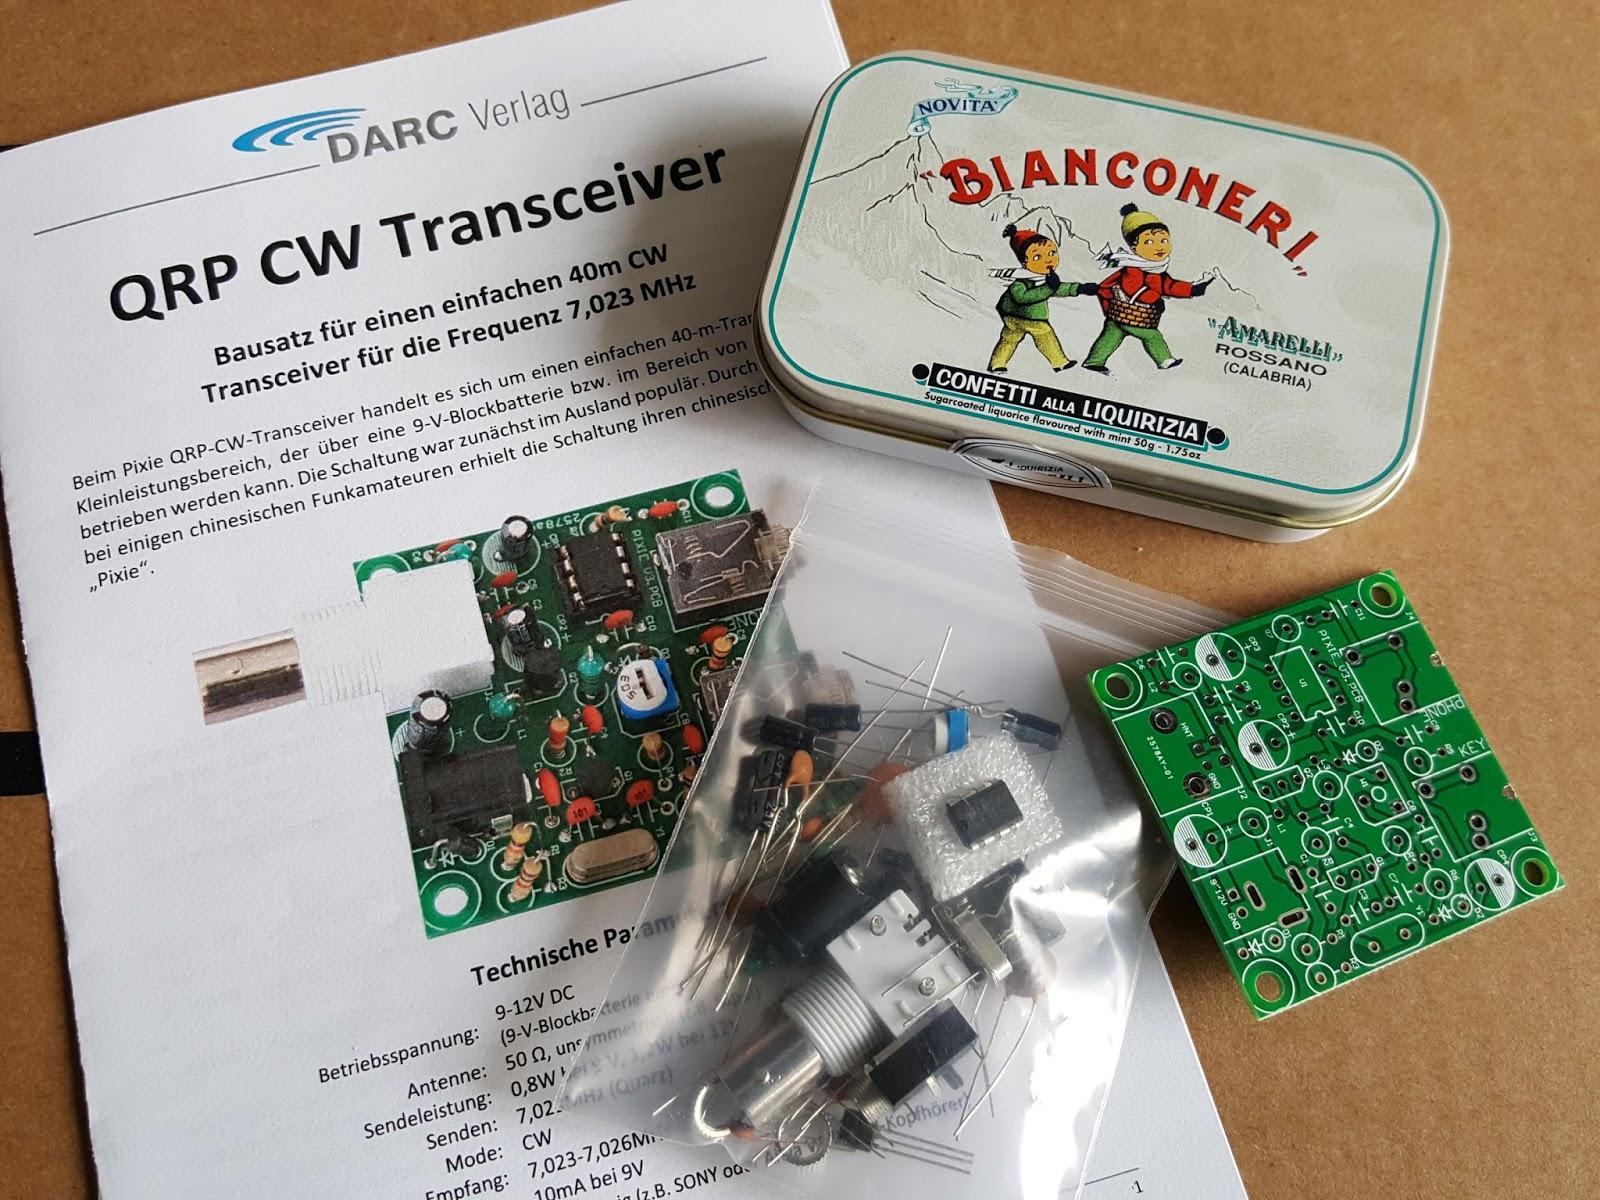 PA7MDJ Amateur Radio Blog: The Pixie QRP CW transceiver